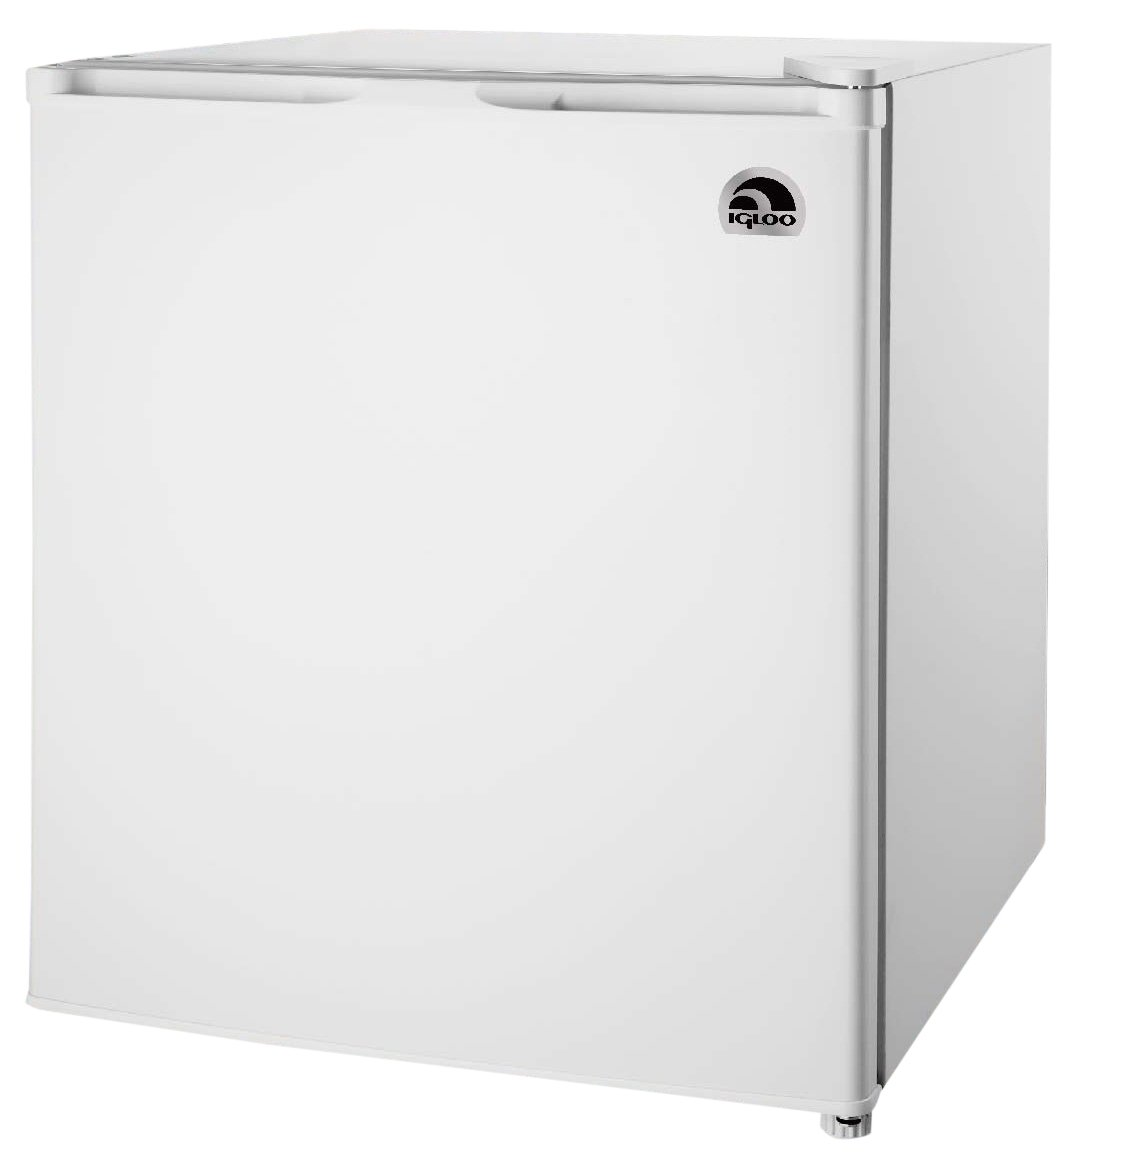 Igloo FRF110 Vertical Freezer, 1.1 cu. ft, White ...